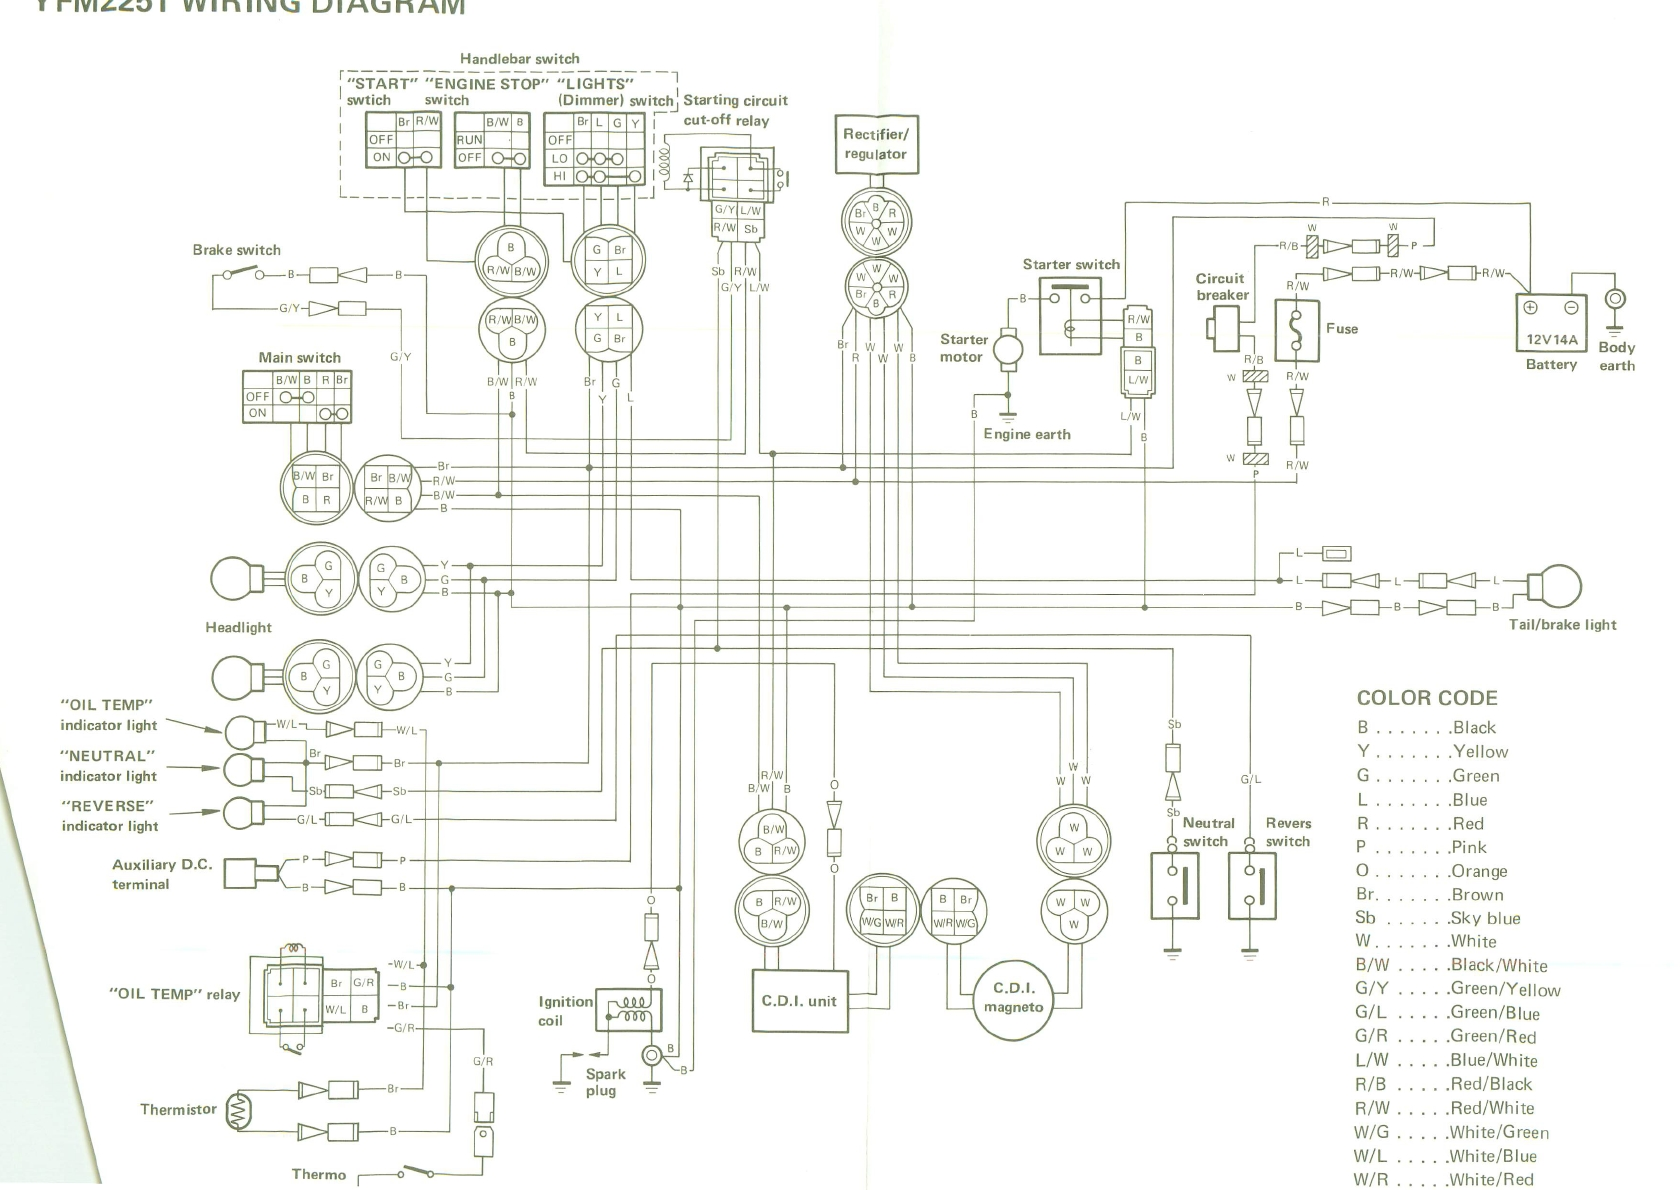 gy wiring diagram gy image wiring diagram yamaha 200 blaster wiring diagram wiring diagram on gy 200 wiring diagram